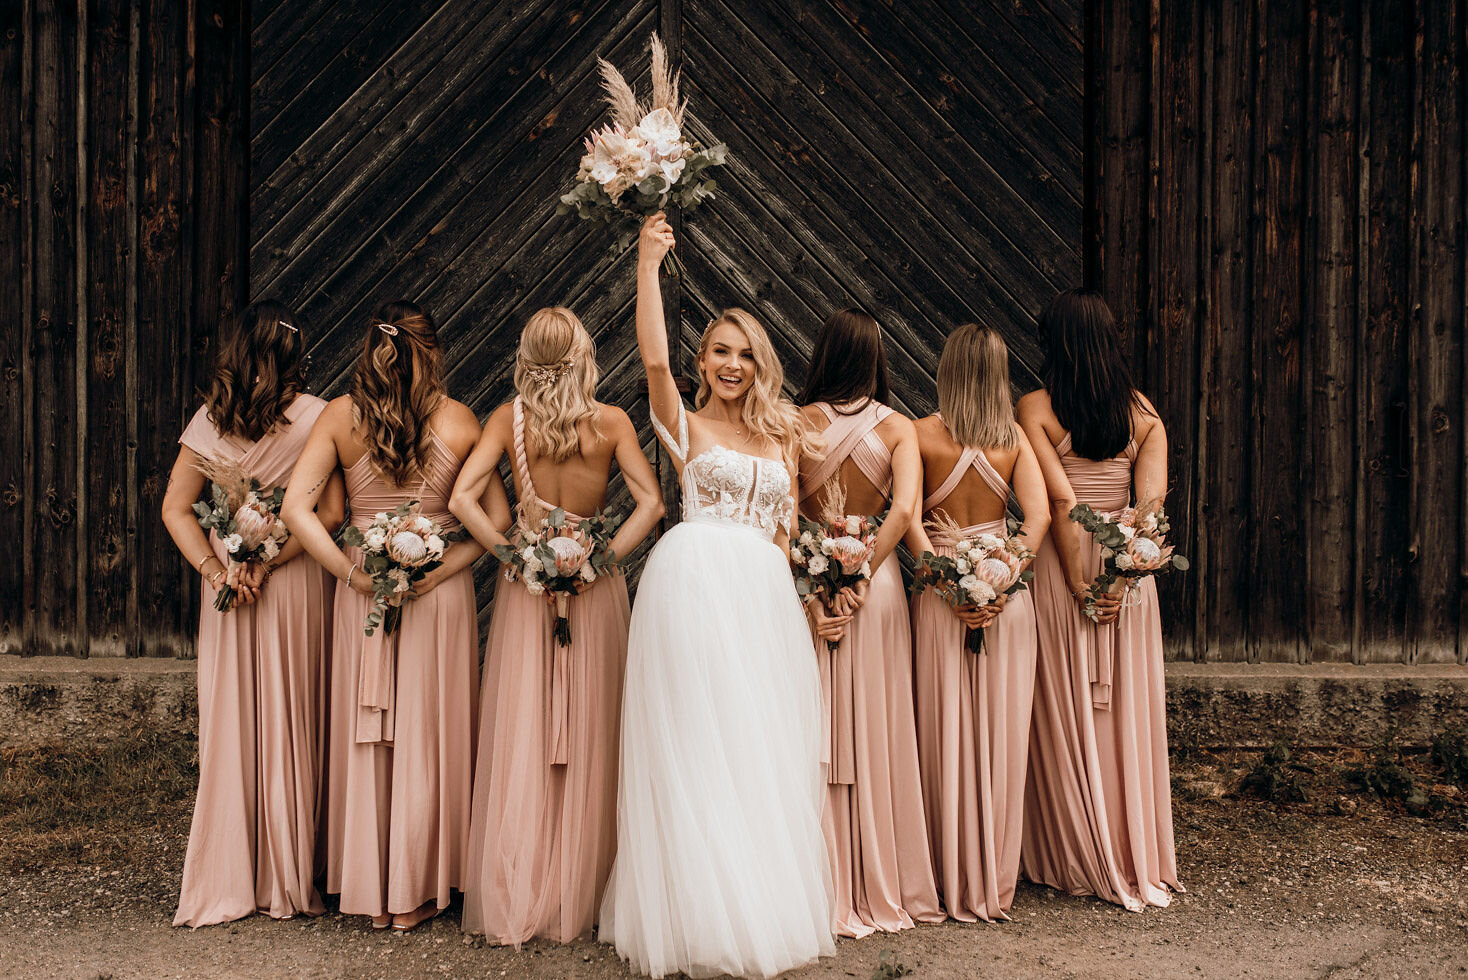 We-Are-Flowergirls-Bridesmaids-Dresses-Bride-PATRIZIA-PALME-©Beloved-Photography-13.jpg